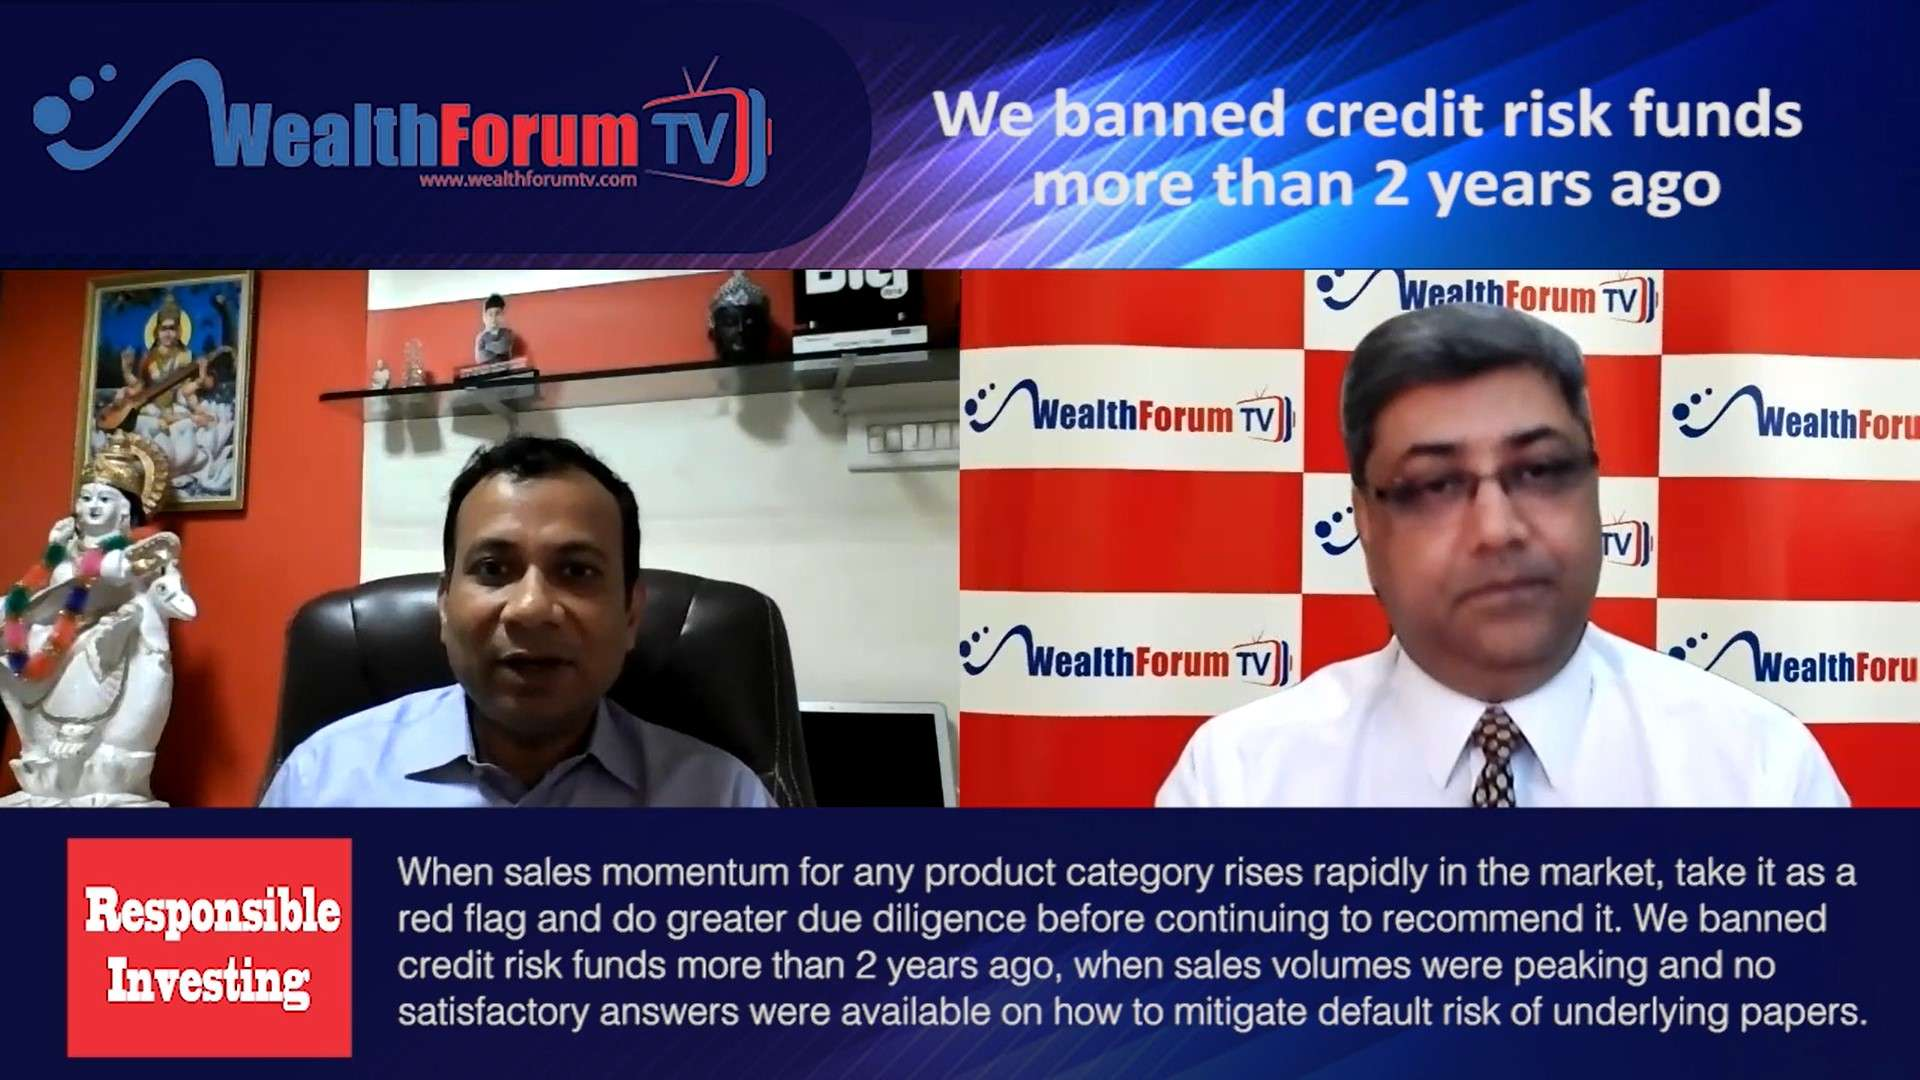 wealth forum